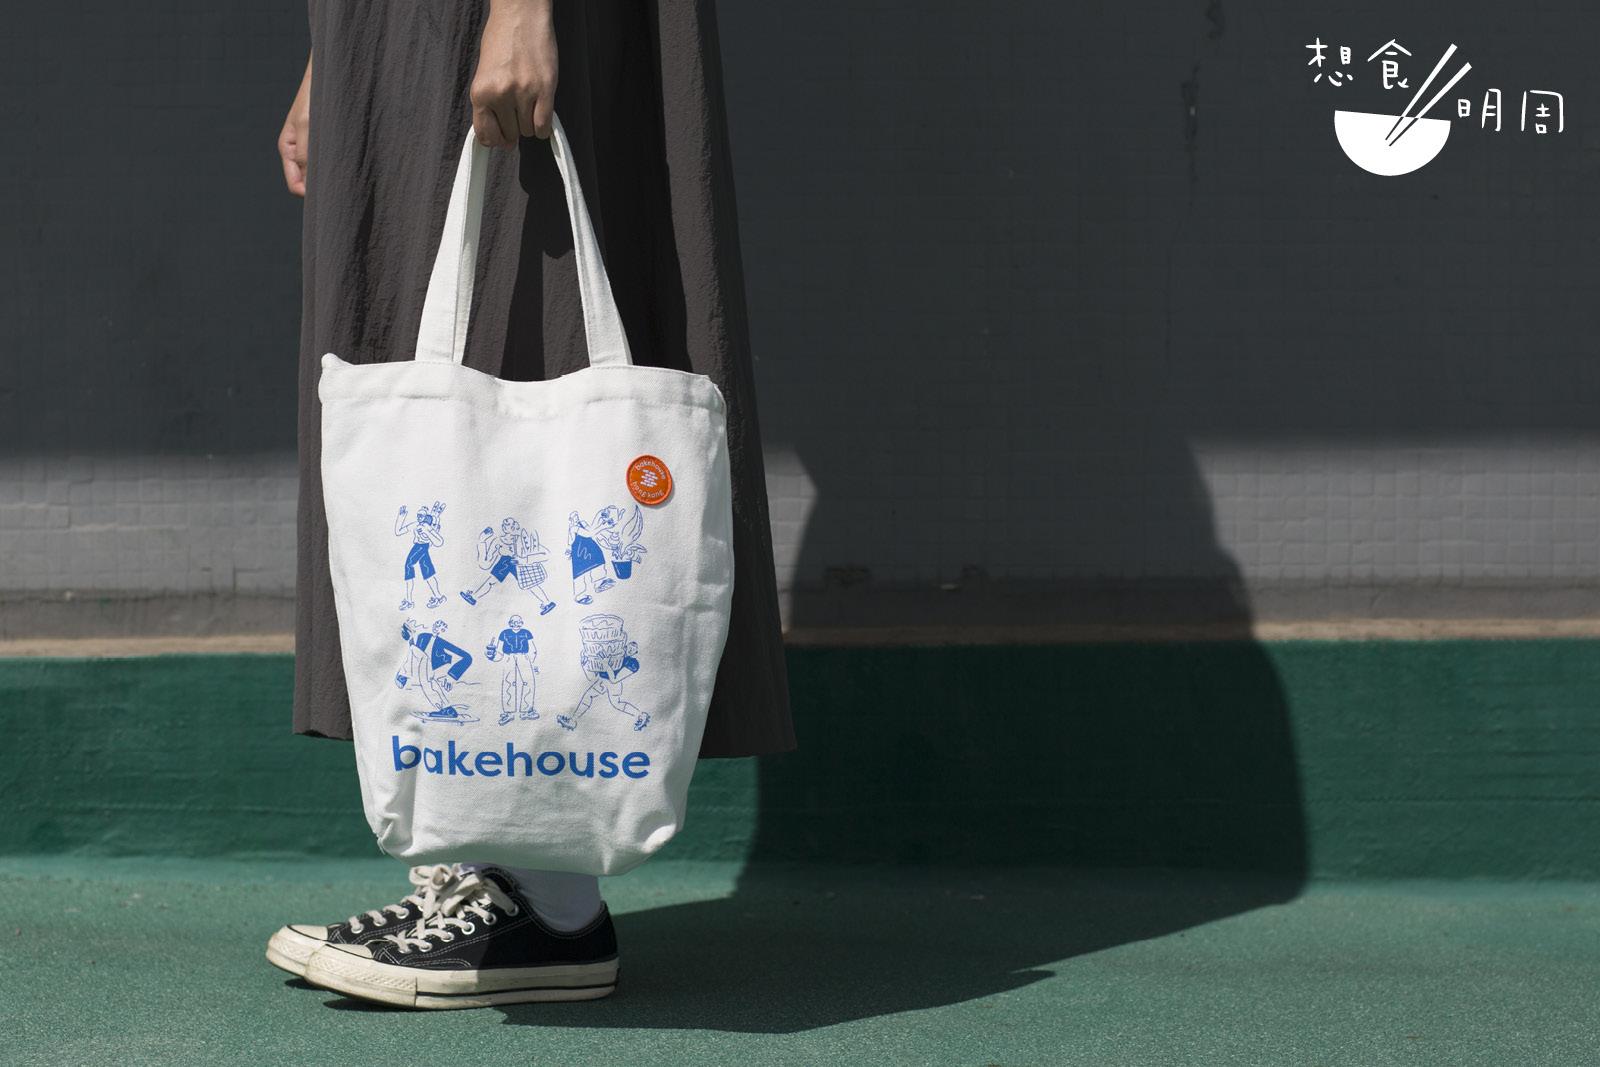 Tote bag的容量大,放下手提電腦也綽綽有餘,返工返學也能使用呢!($100)